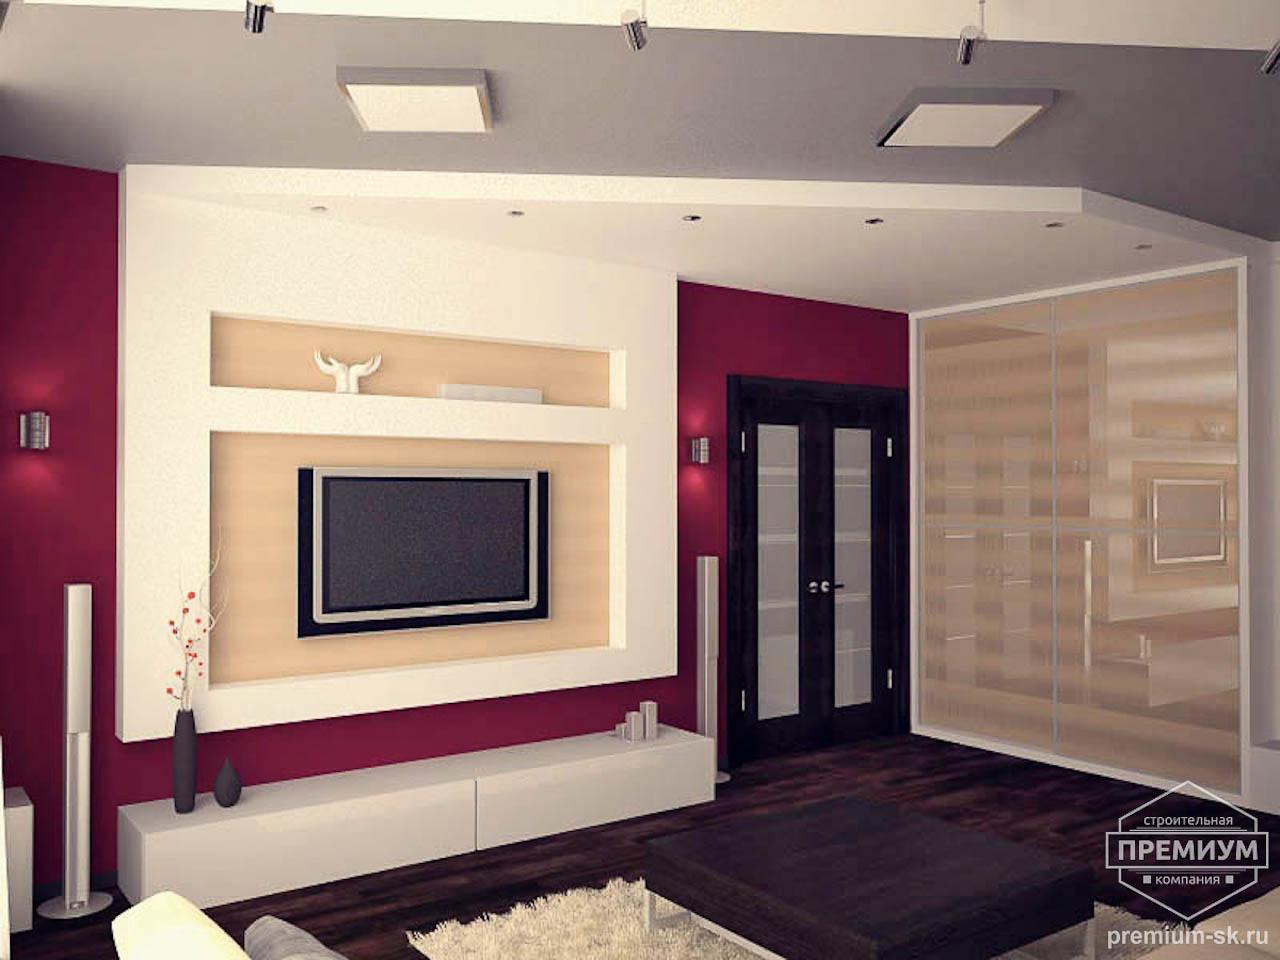 Дизайн интерьера однокомнатной квартиры по ул. Сыромолотова 11 img1009537976